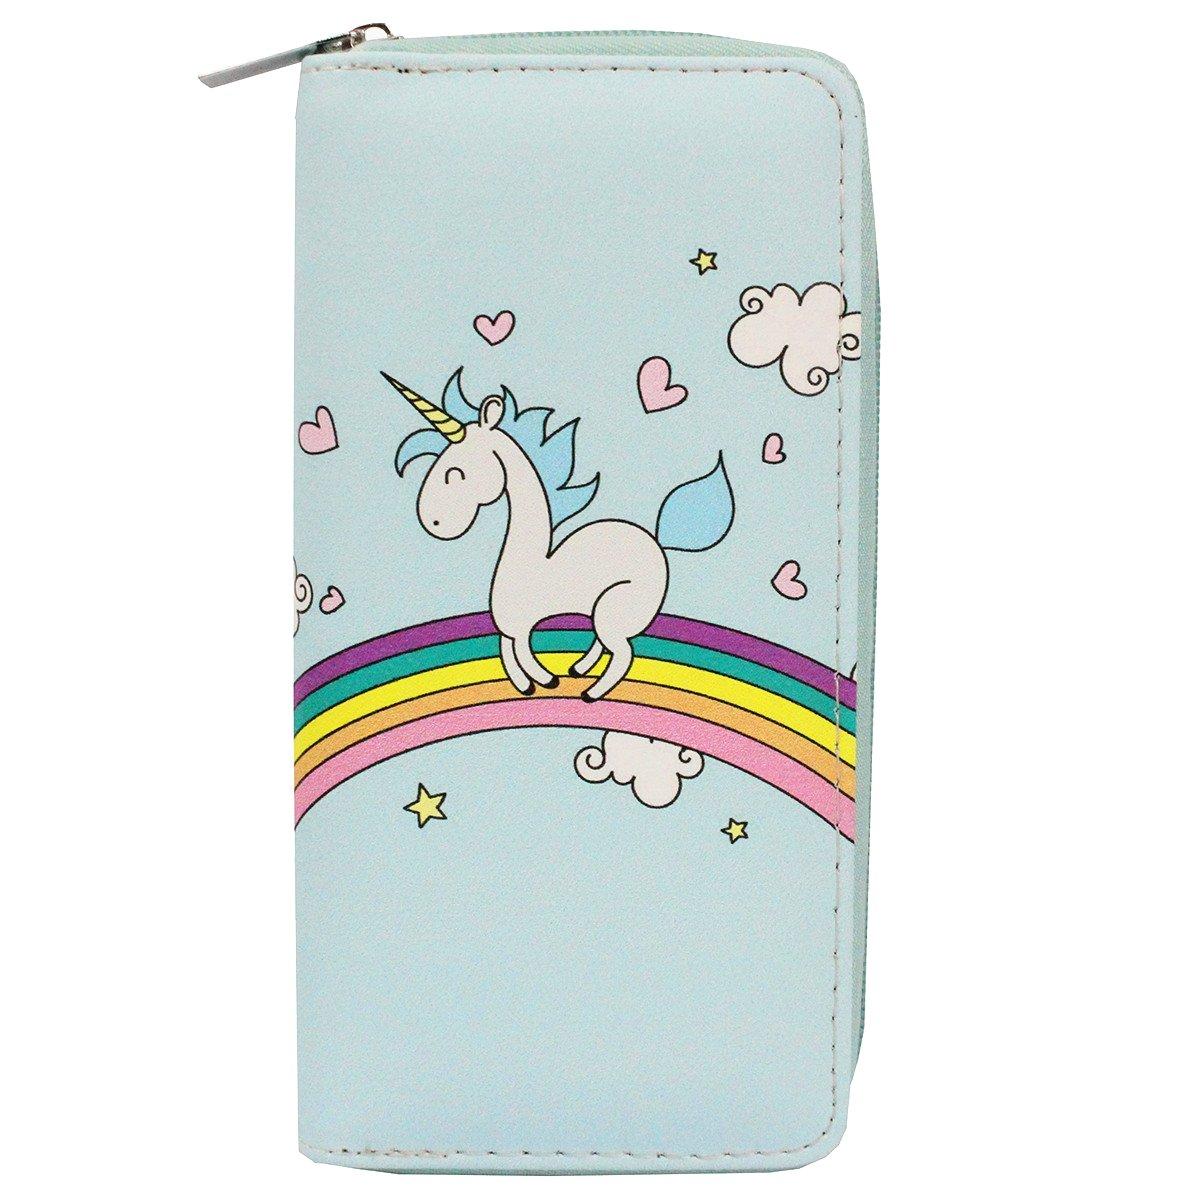 Timlee Cute Rainbow Unicorn Long Wallets Long Purse (Unicorn Blue)